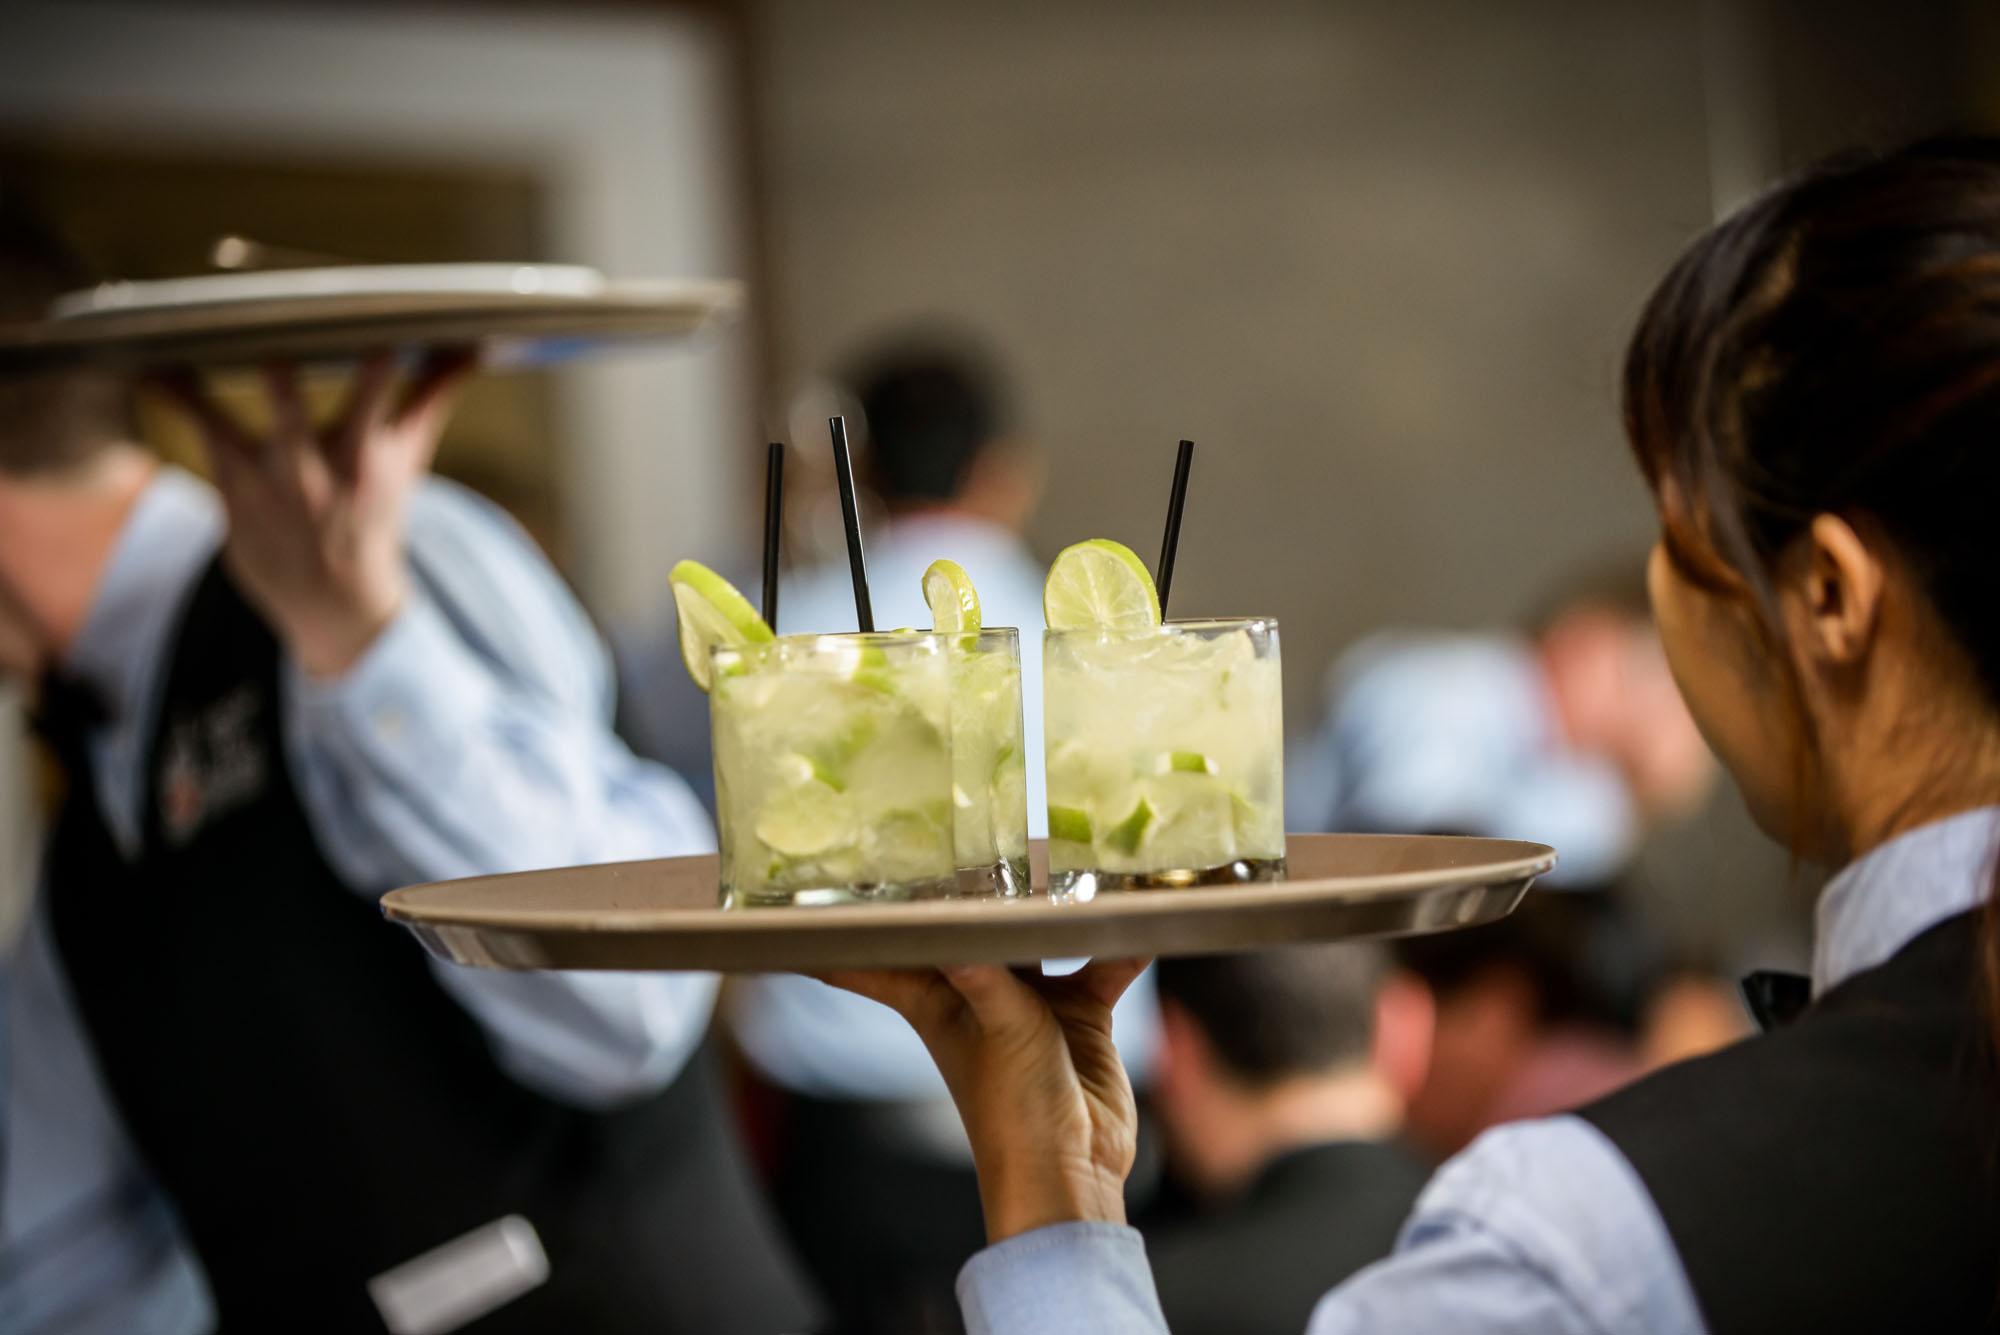 6334_d800b_Fogo_de_Chao_San_Jose_Restaurant_Food_Photography.jpg